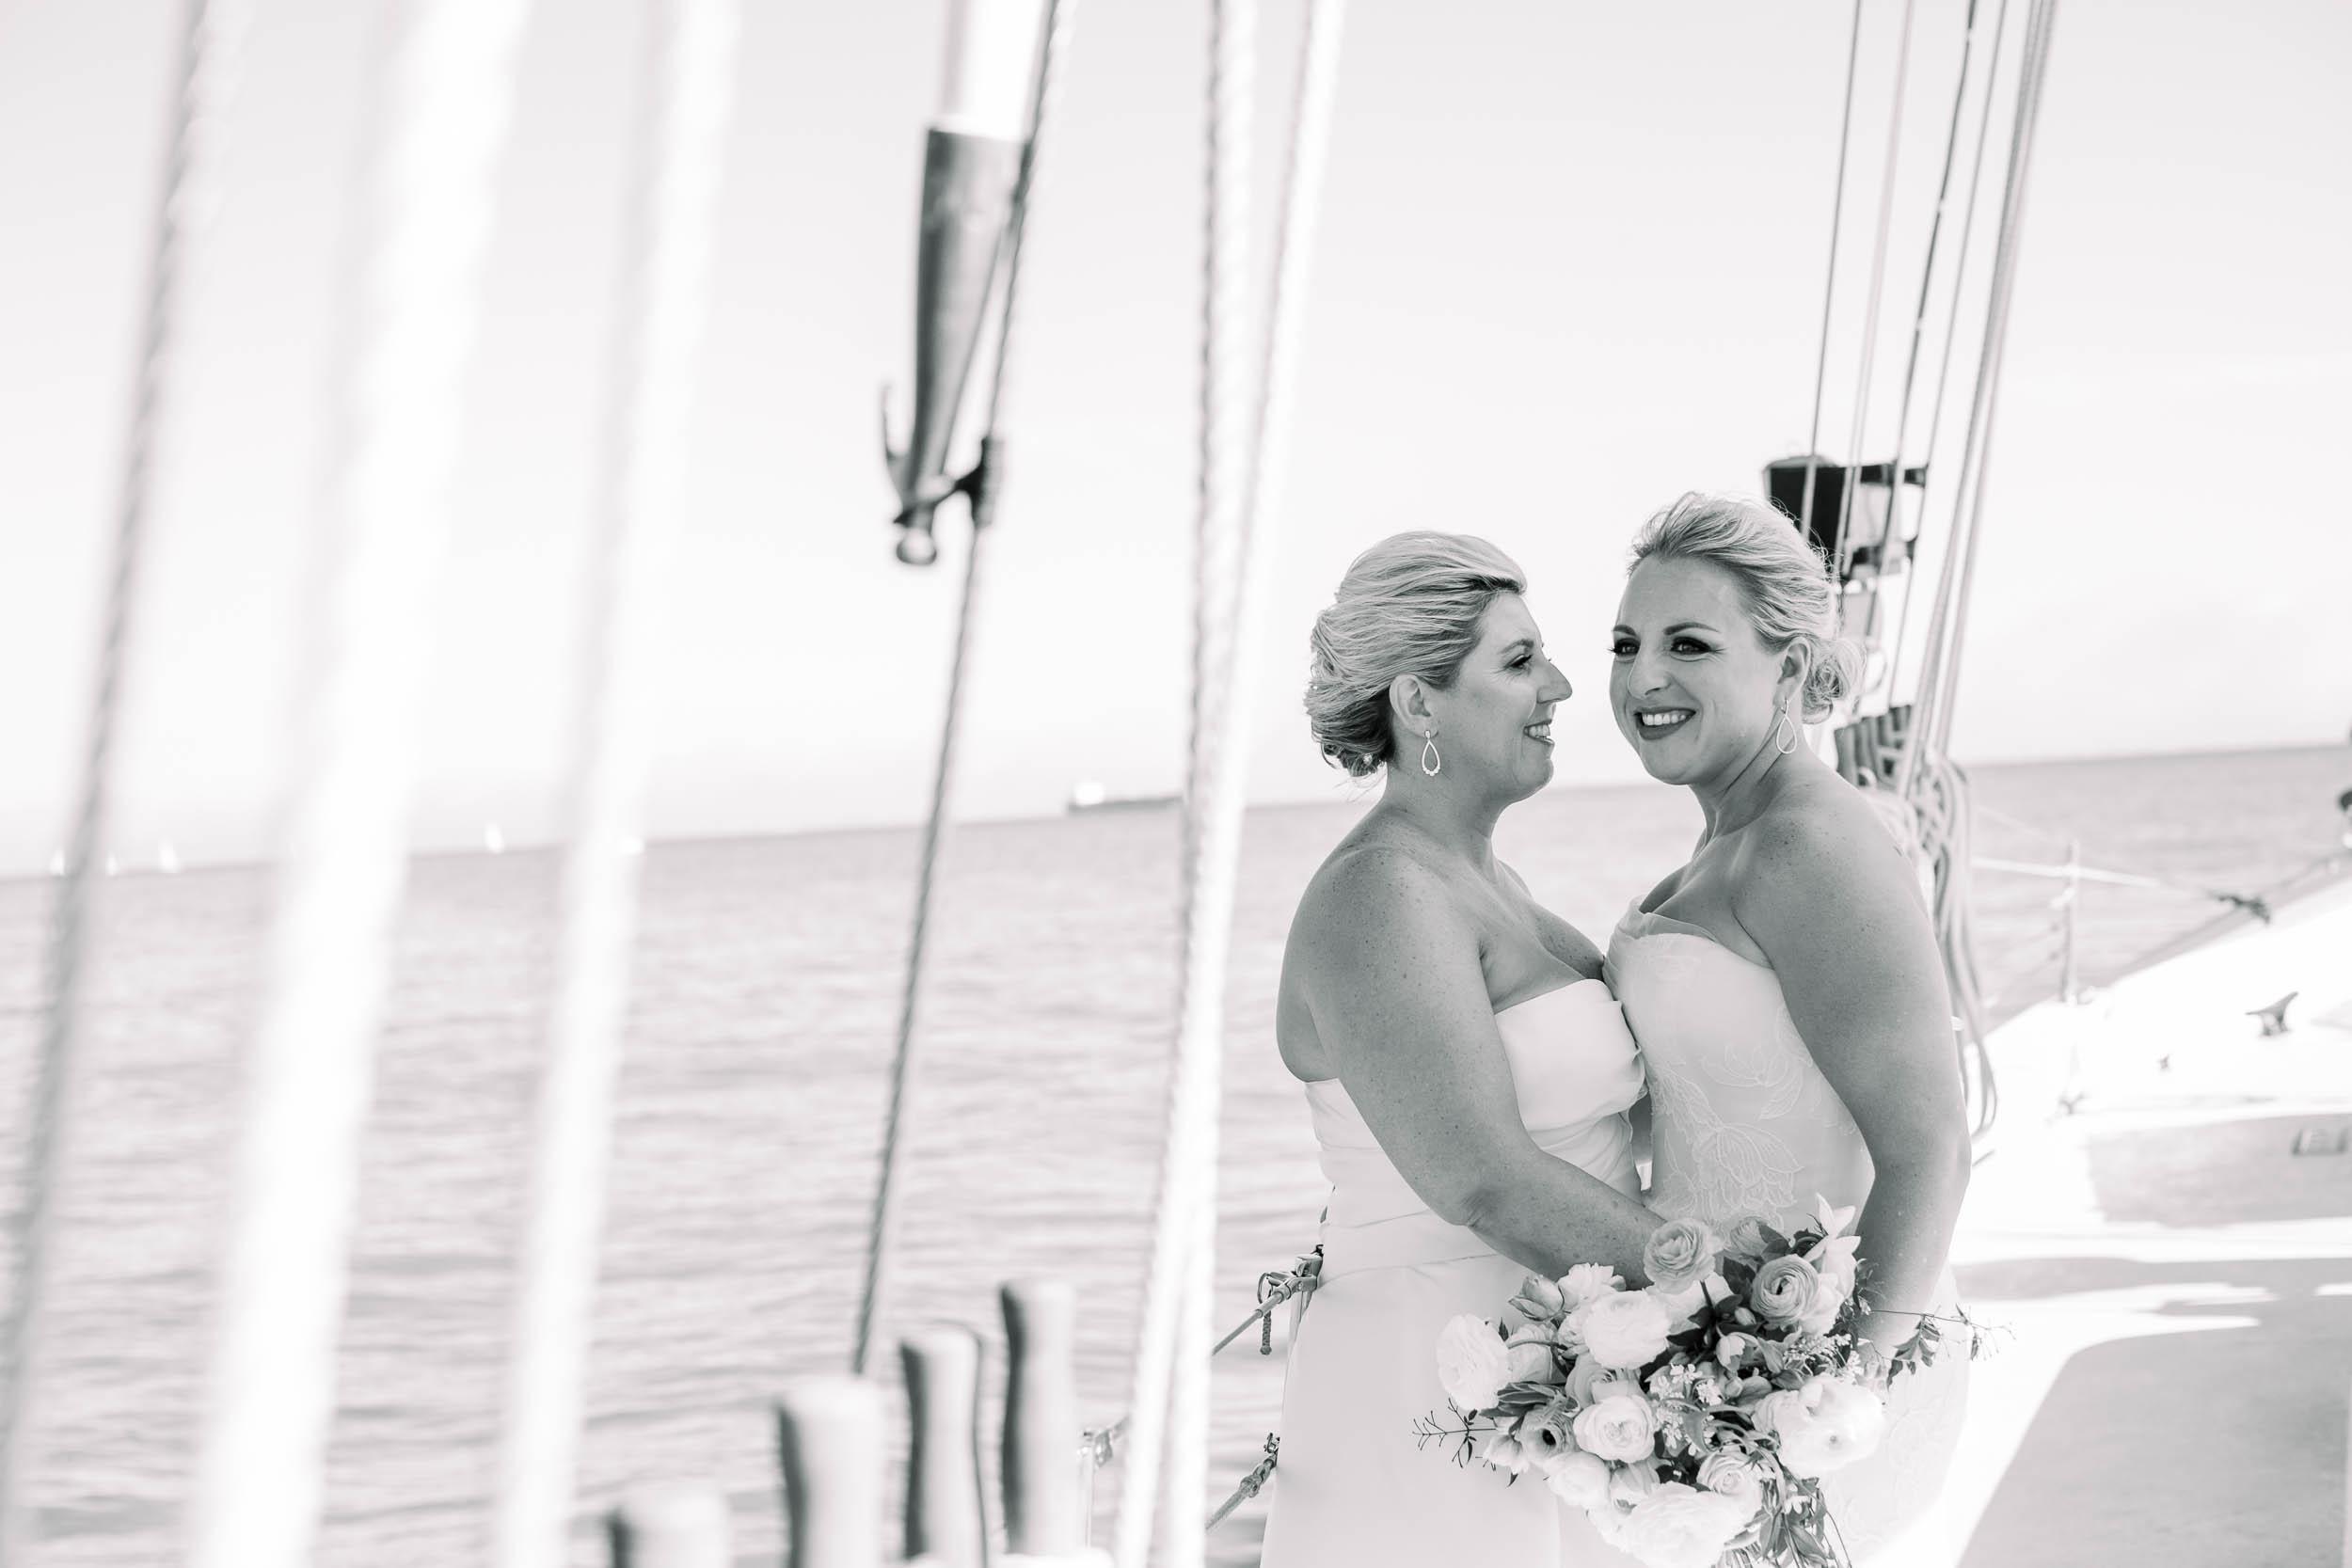 092218ER389_Sausalito Yacht Club Wedding_Buena Lane Photography.jpg